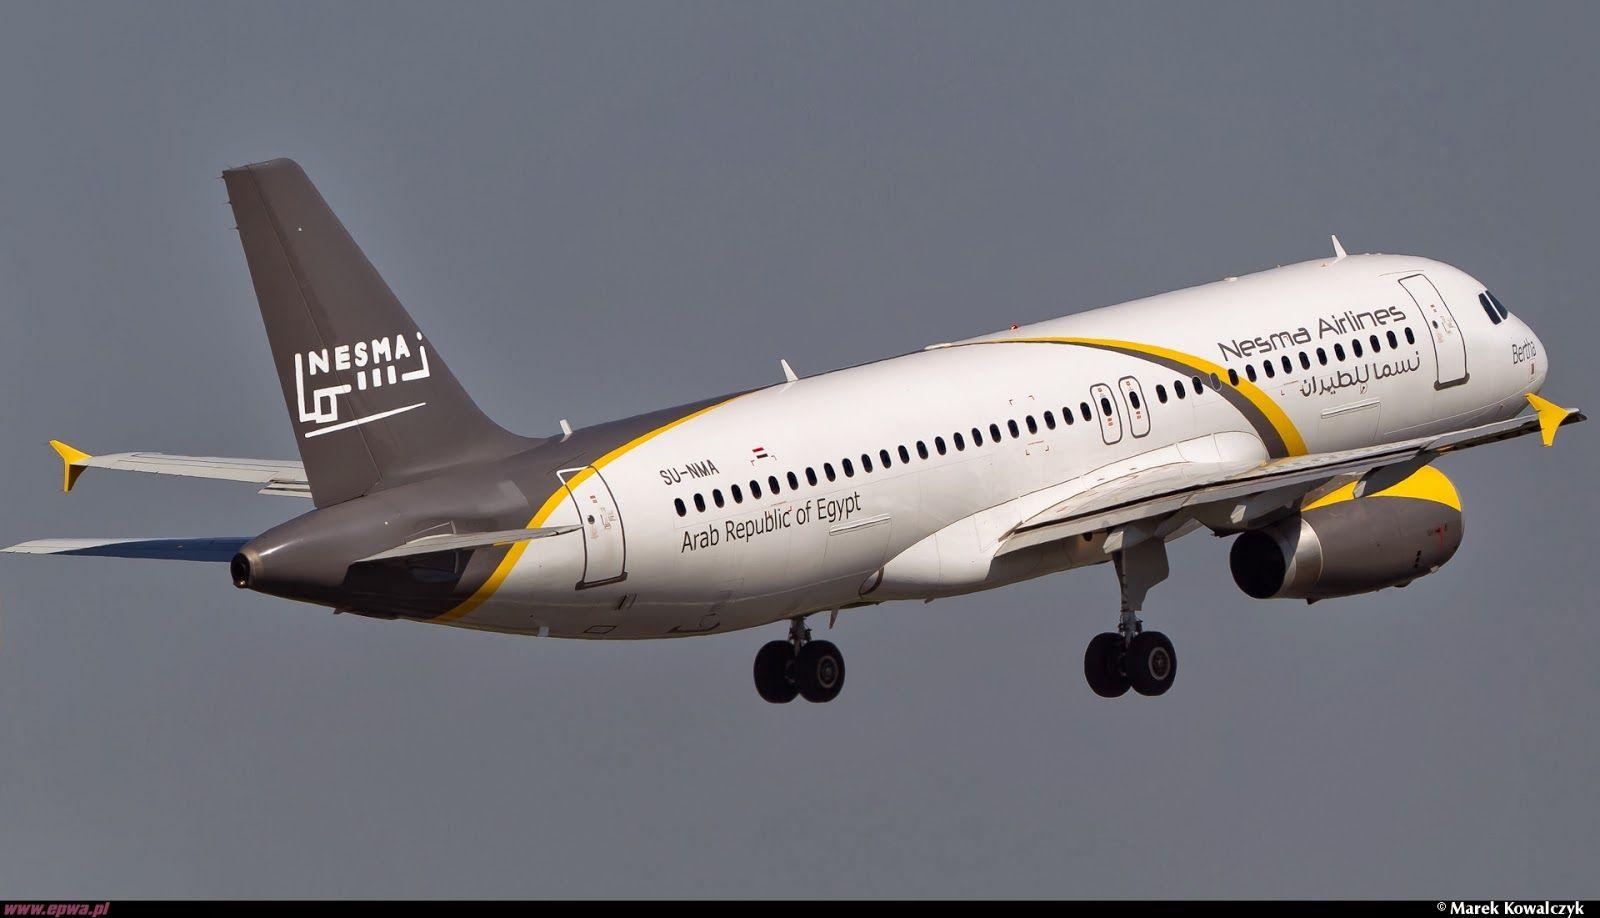 Pin By Fawaz Faiz On أينما كانت وجهتك طيران نسما صديقك في رحلتك Airline Booking Passenger Jet Aircraft